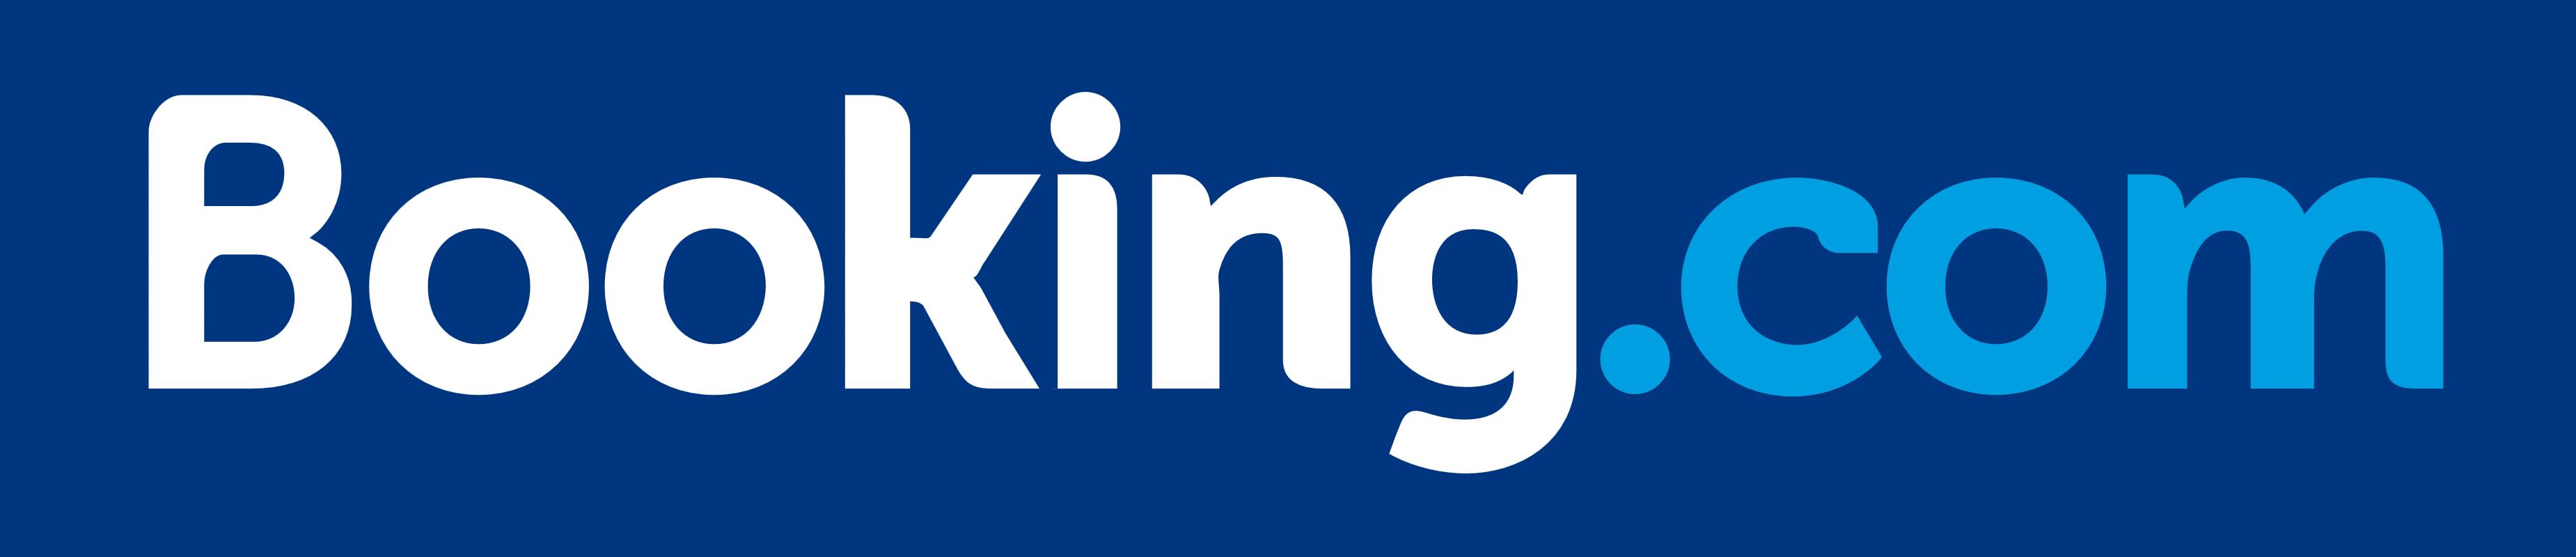 Logo Booking Com PNG - 31506